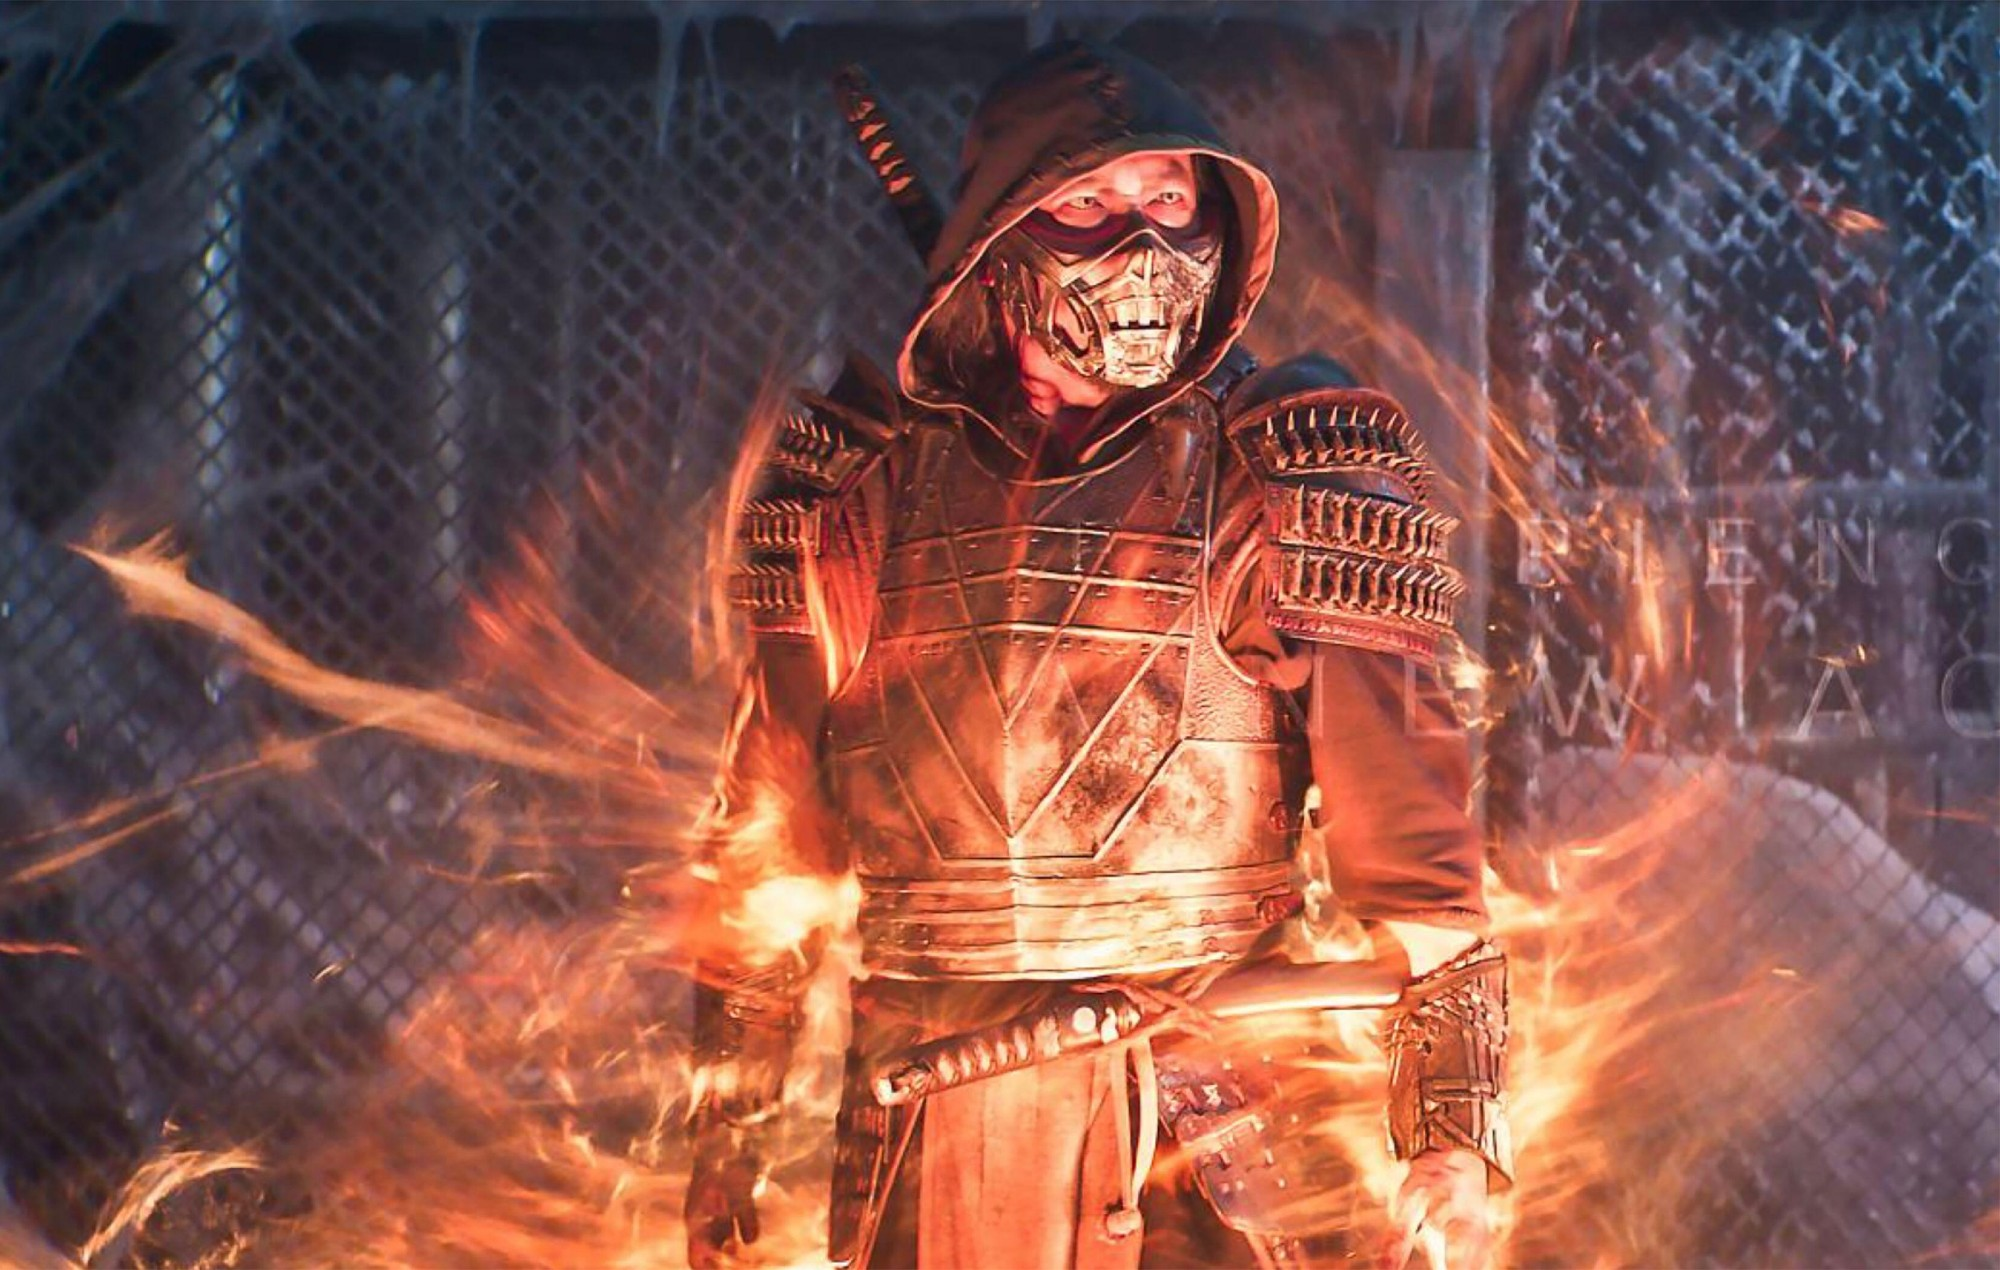 Mortal Kombat Joe Taslim as Bi-Han_Sub-Zero